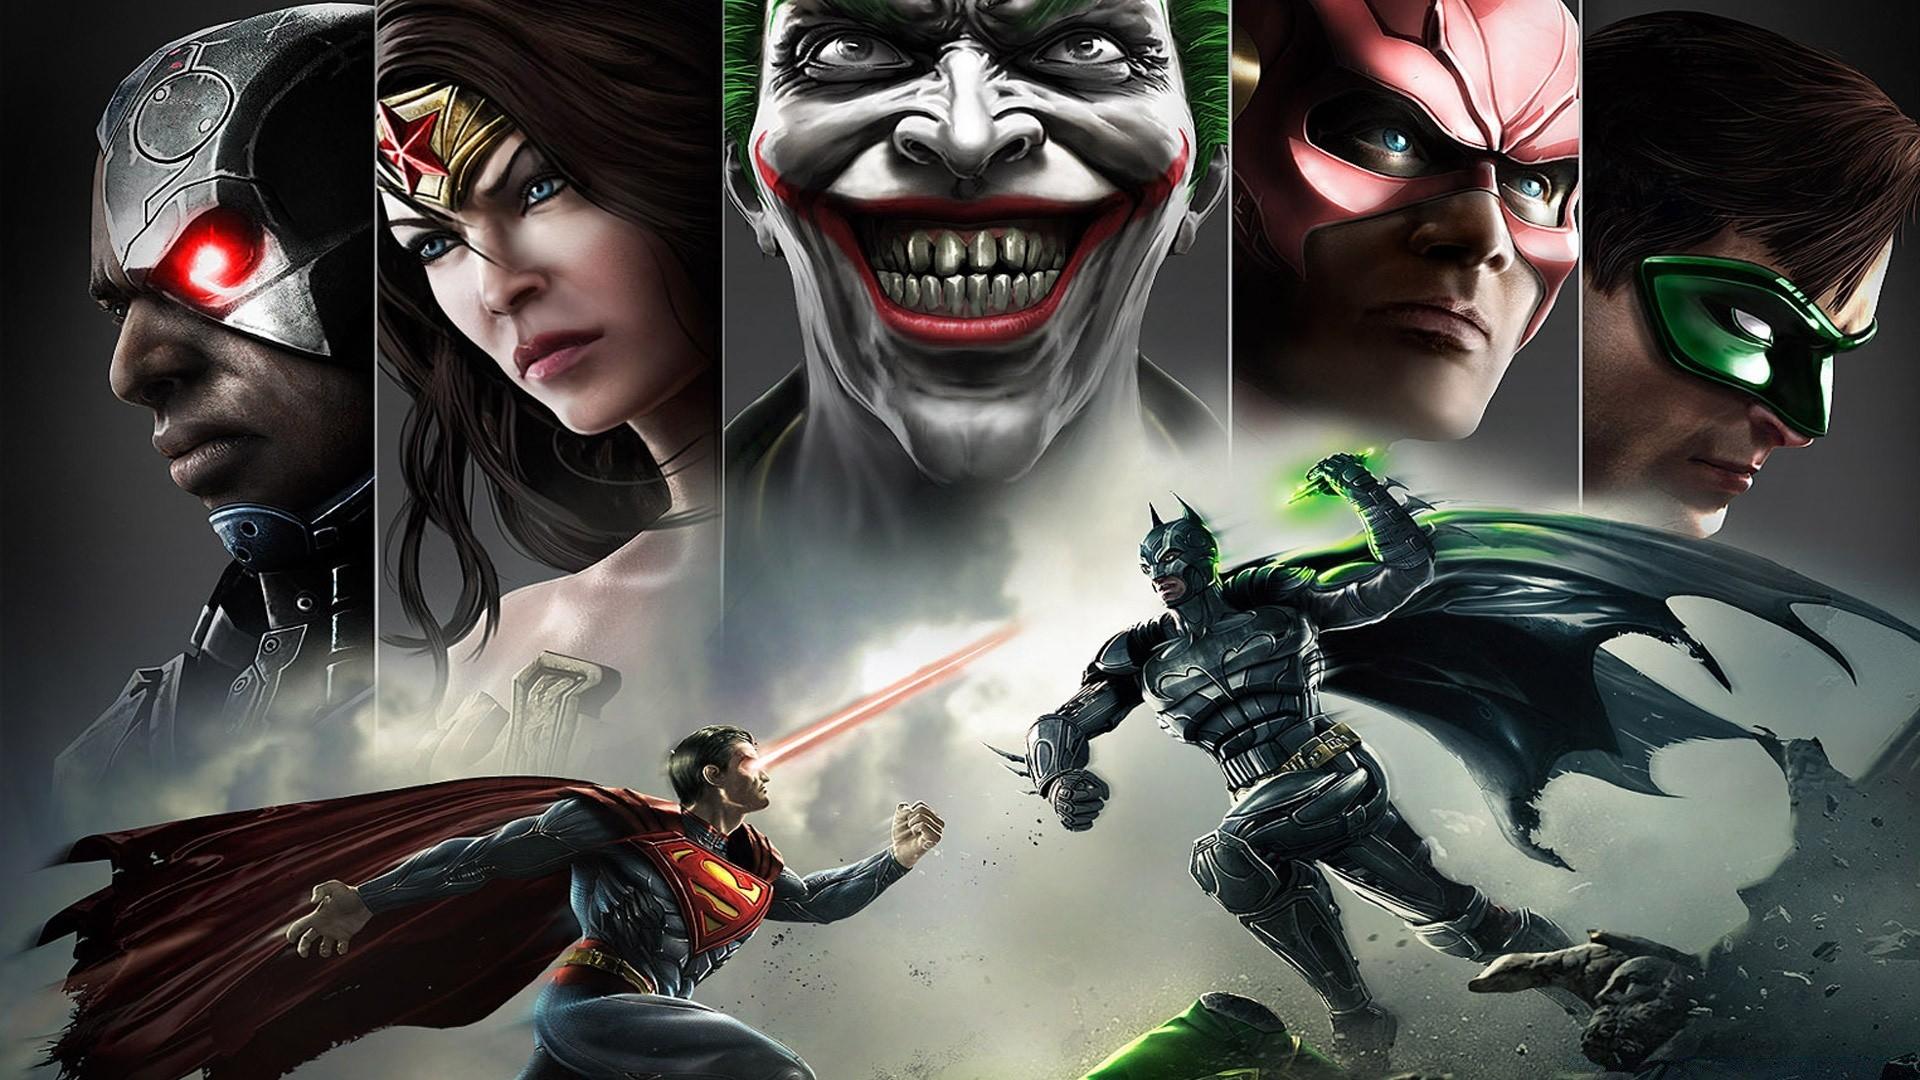 Injustice Superman Vs Batman IPhone Wallpapers For Free